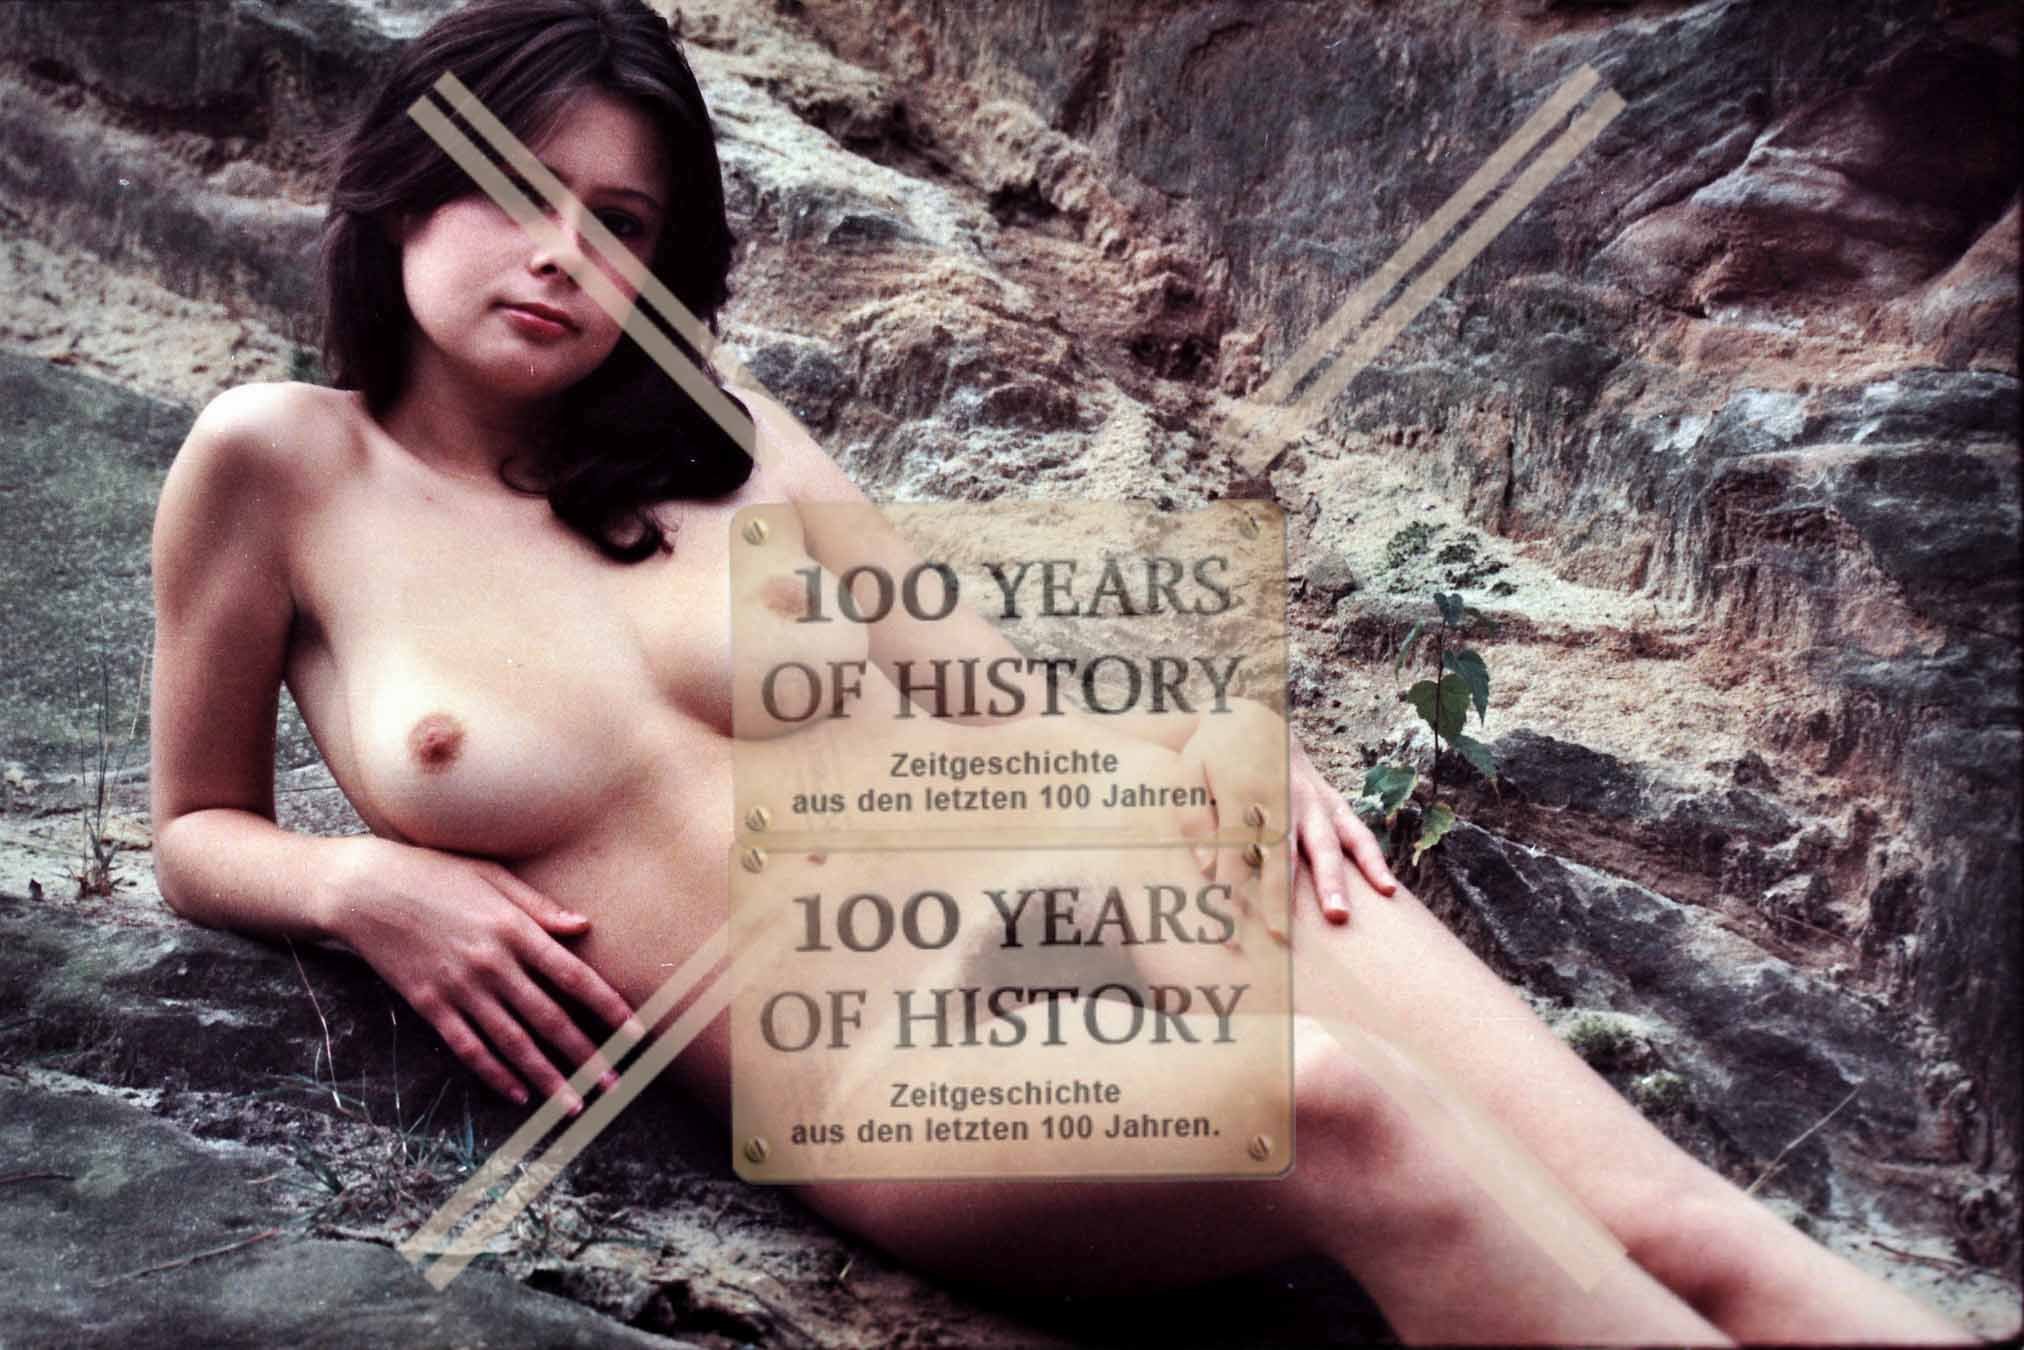 sauna sex erotisk historie